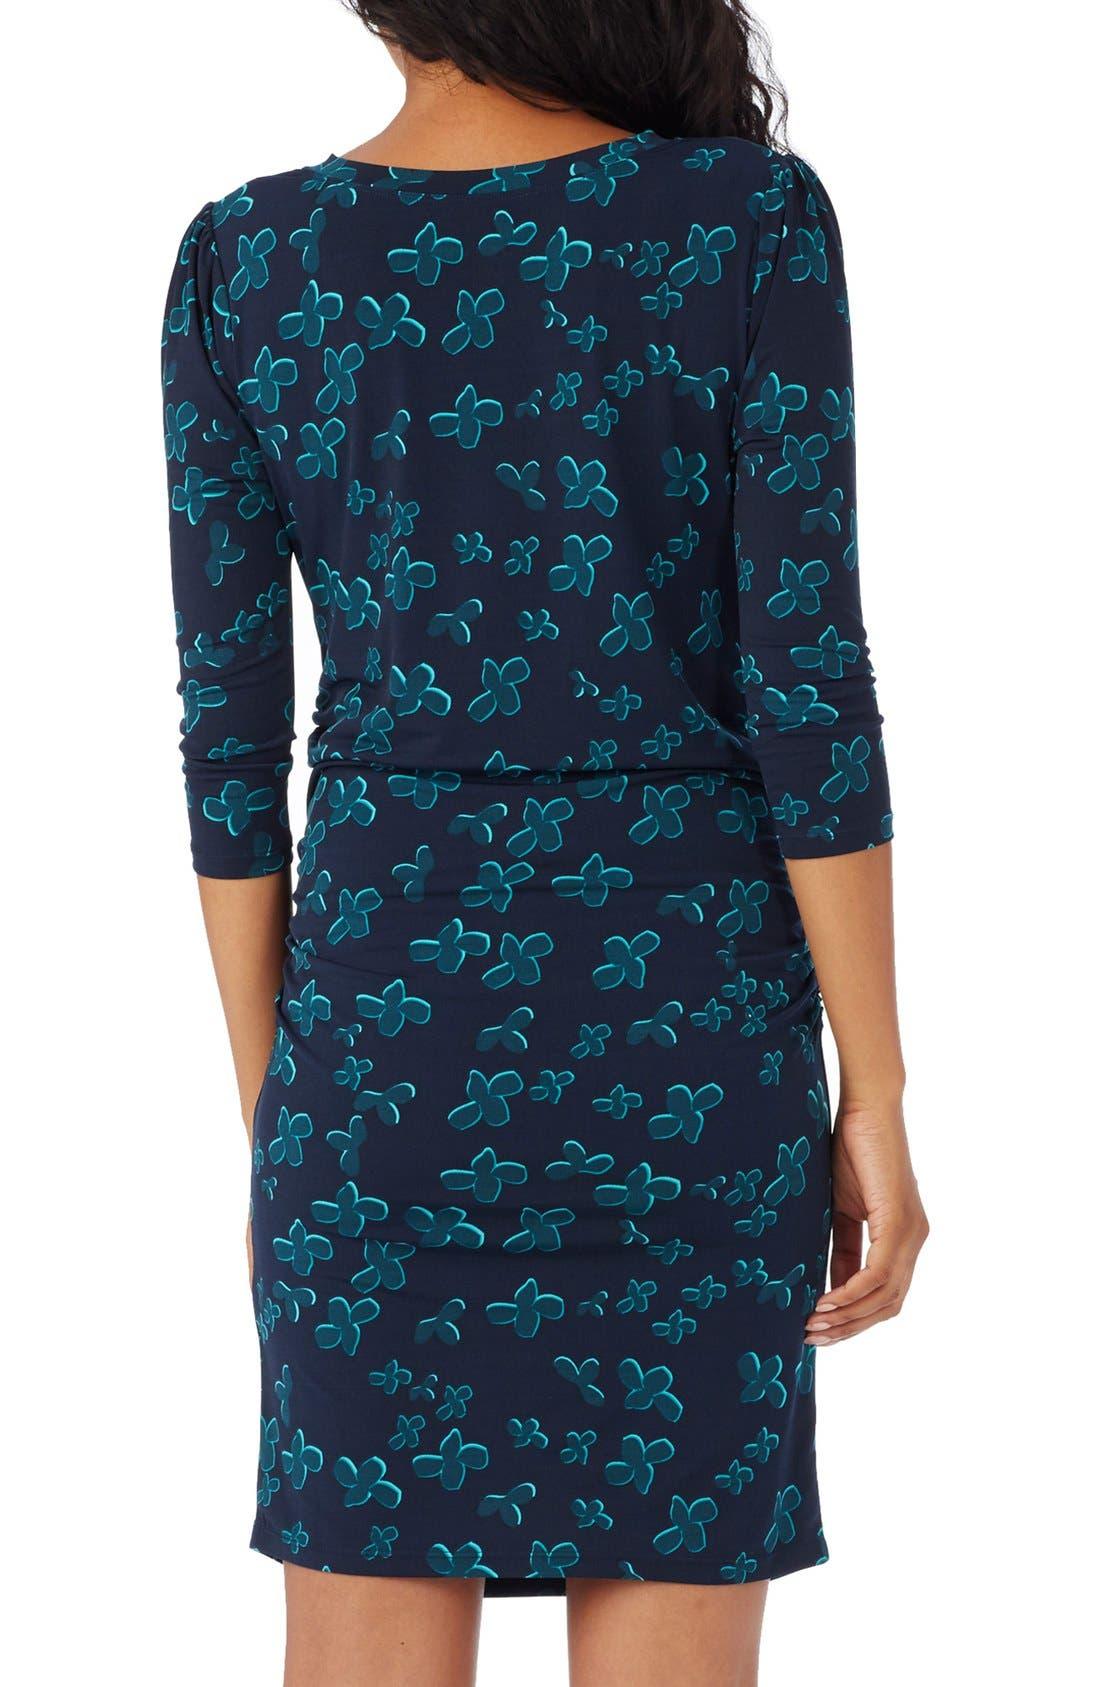 'Stephanie' Knit Maternity Dress,                             Alternate thumbnail 2, color,                             405